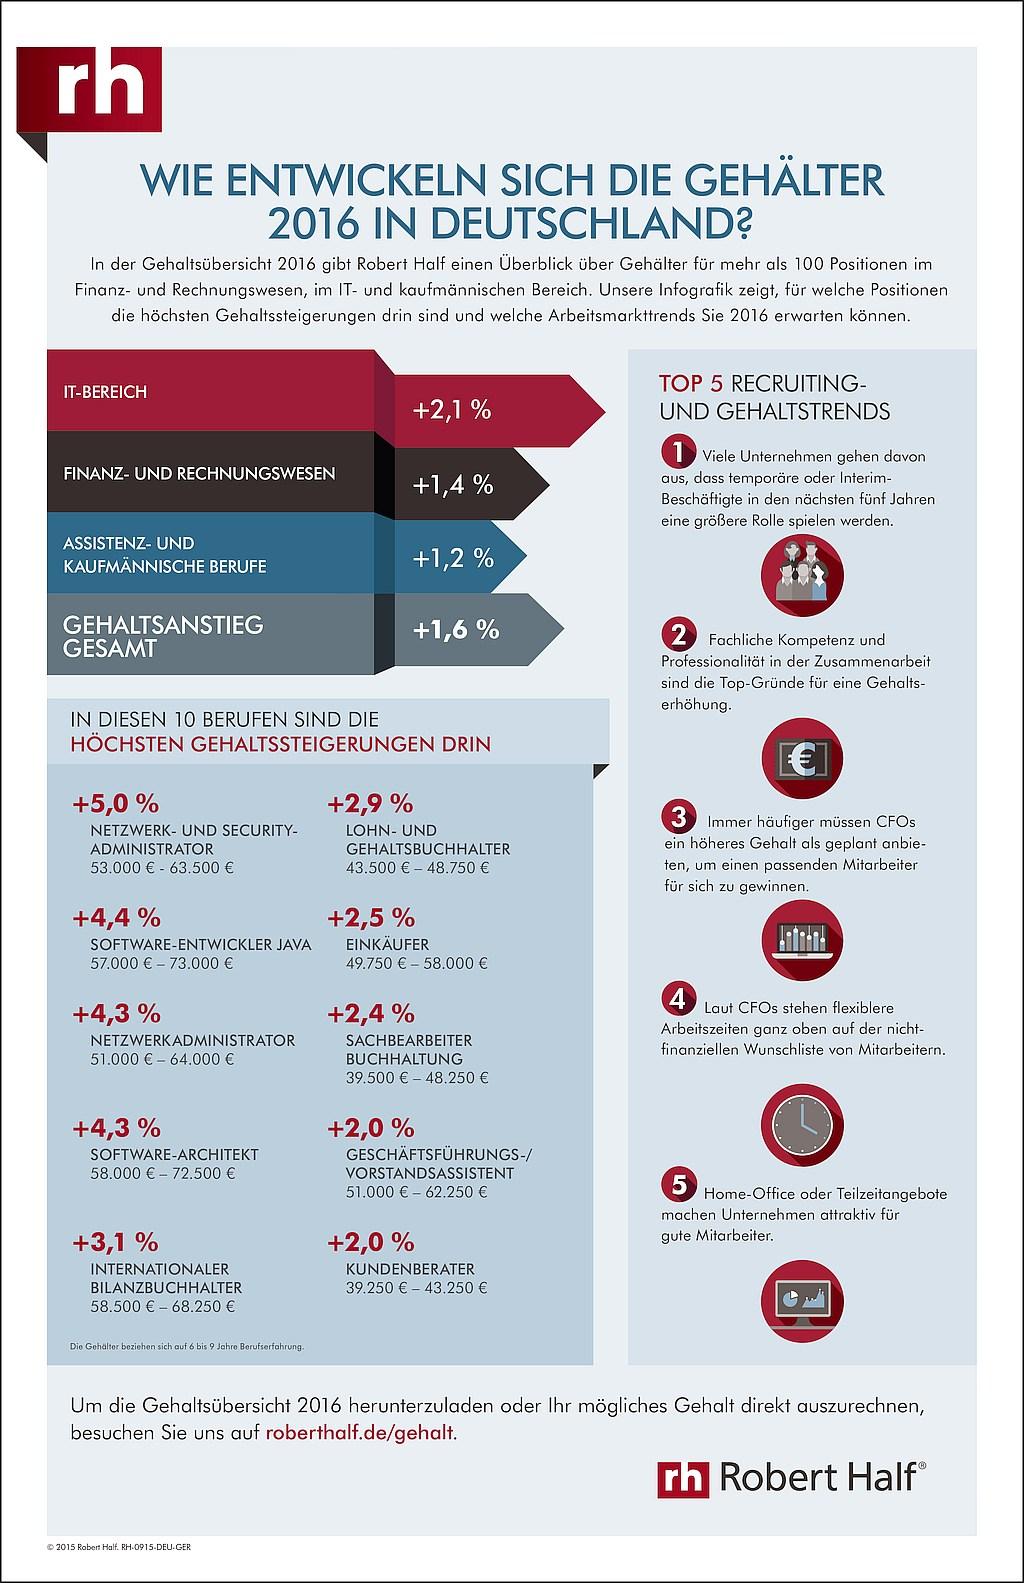 infografik robert half gehaltsentwicklung 2016